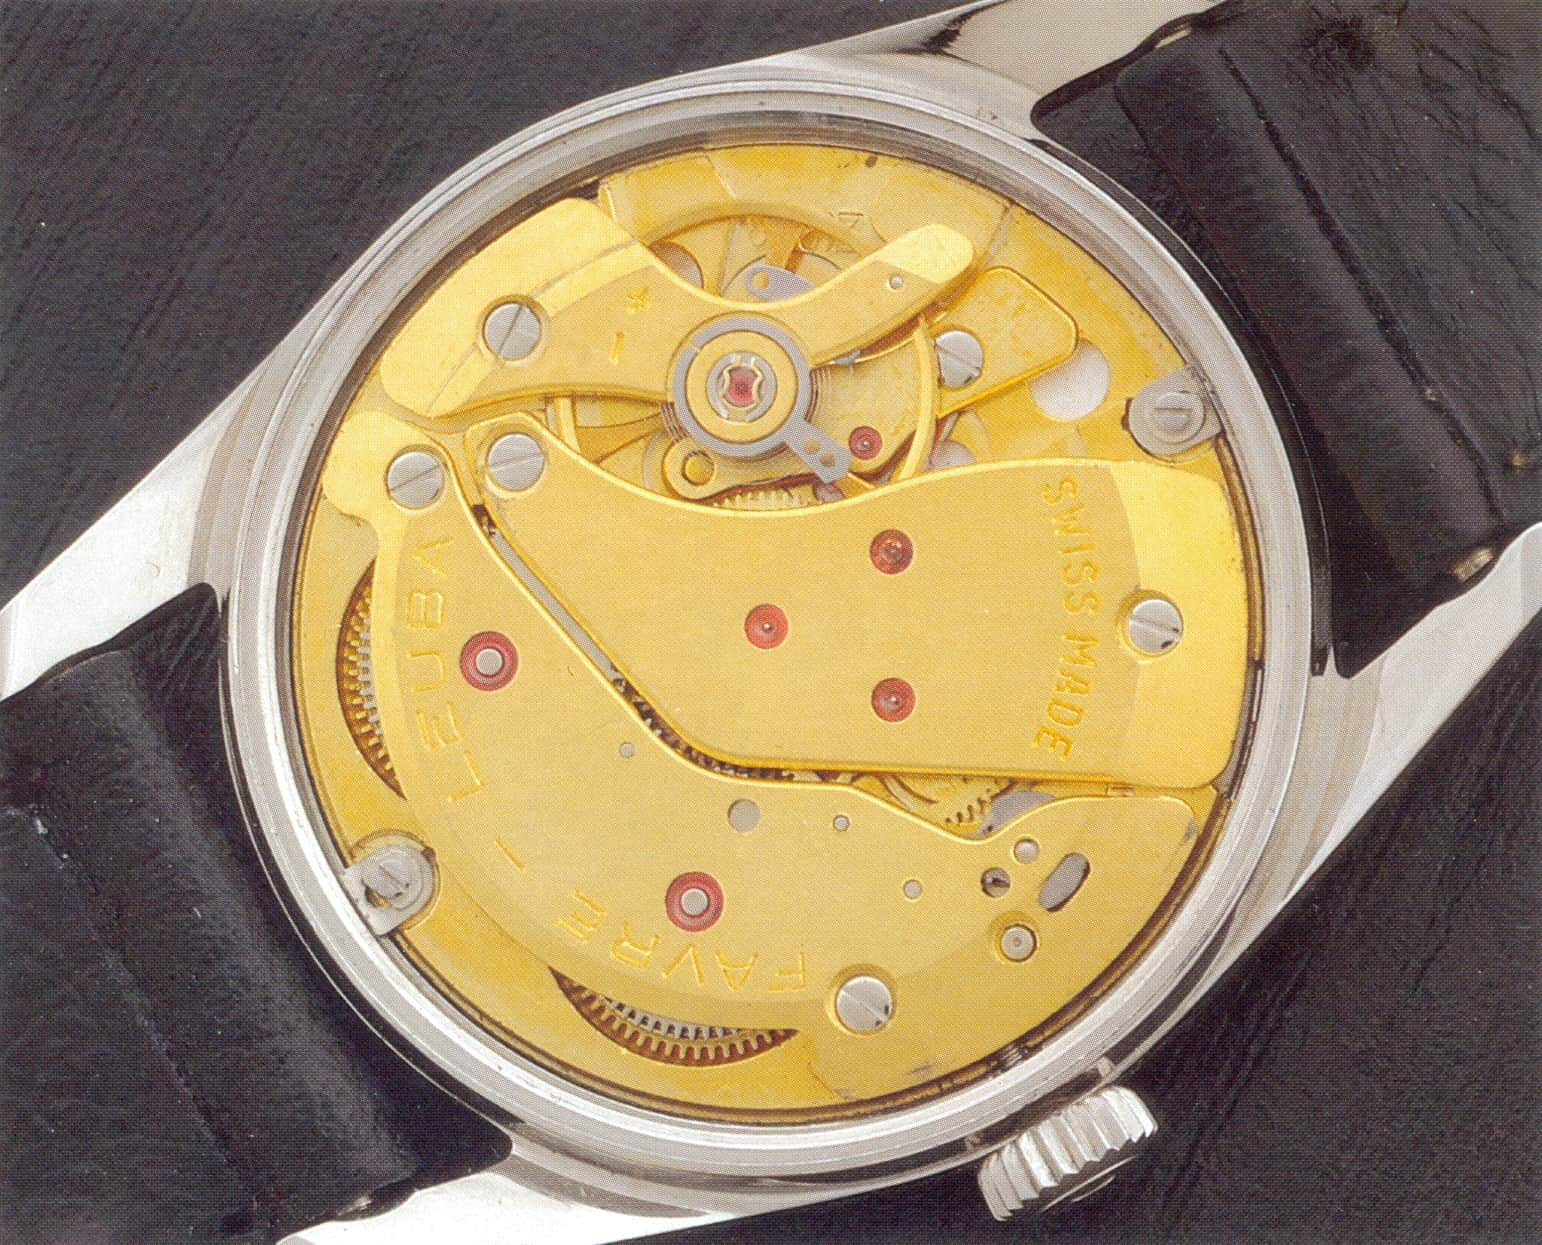 Favre-Leuba-Handaufzug-Kaliber-253-1962-Rueckseit-(C)-Uhrenkosmos